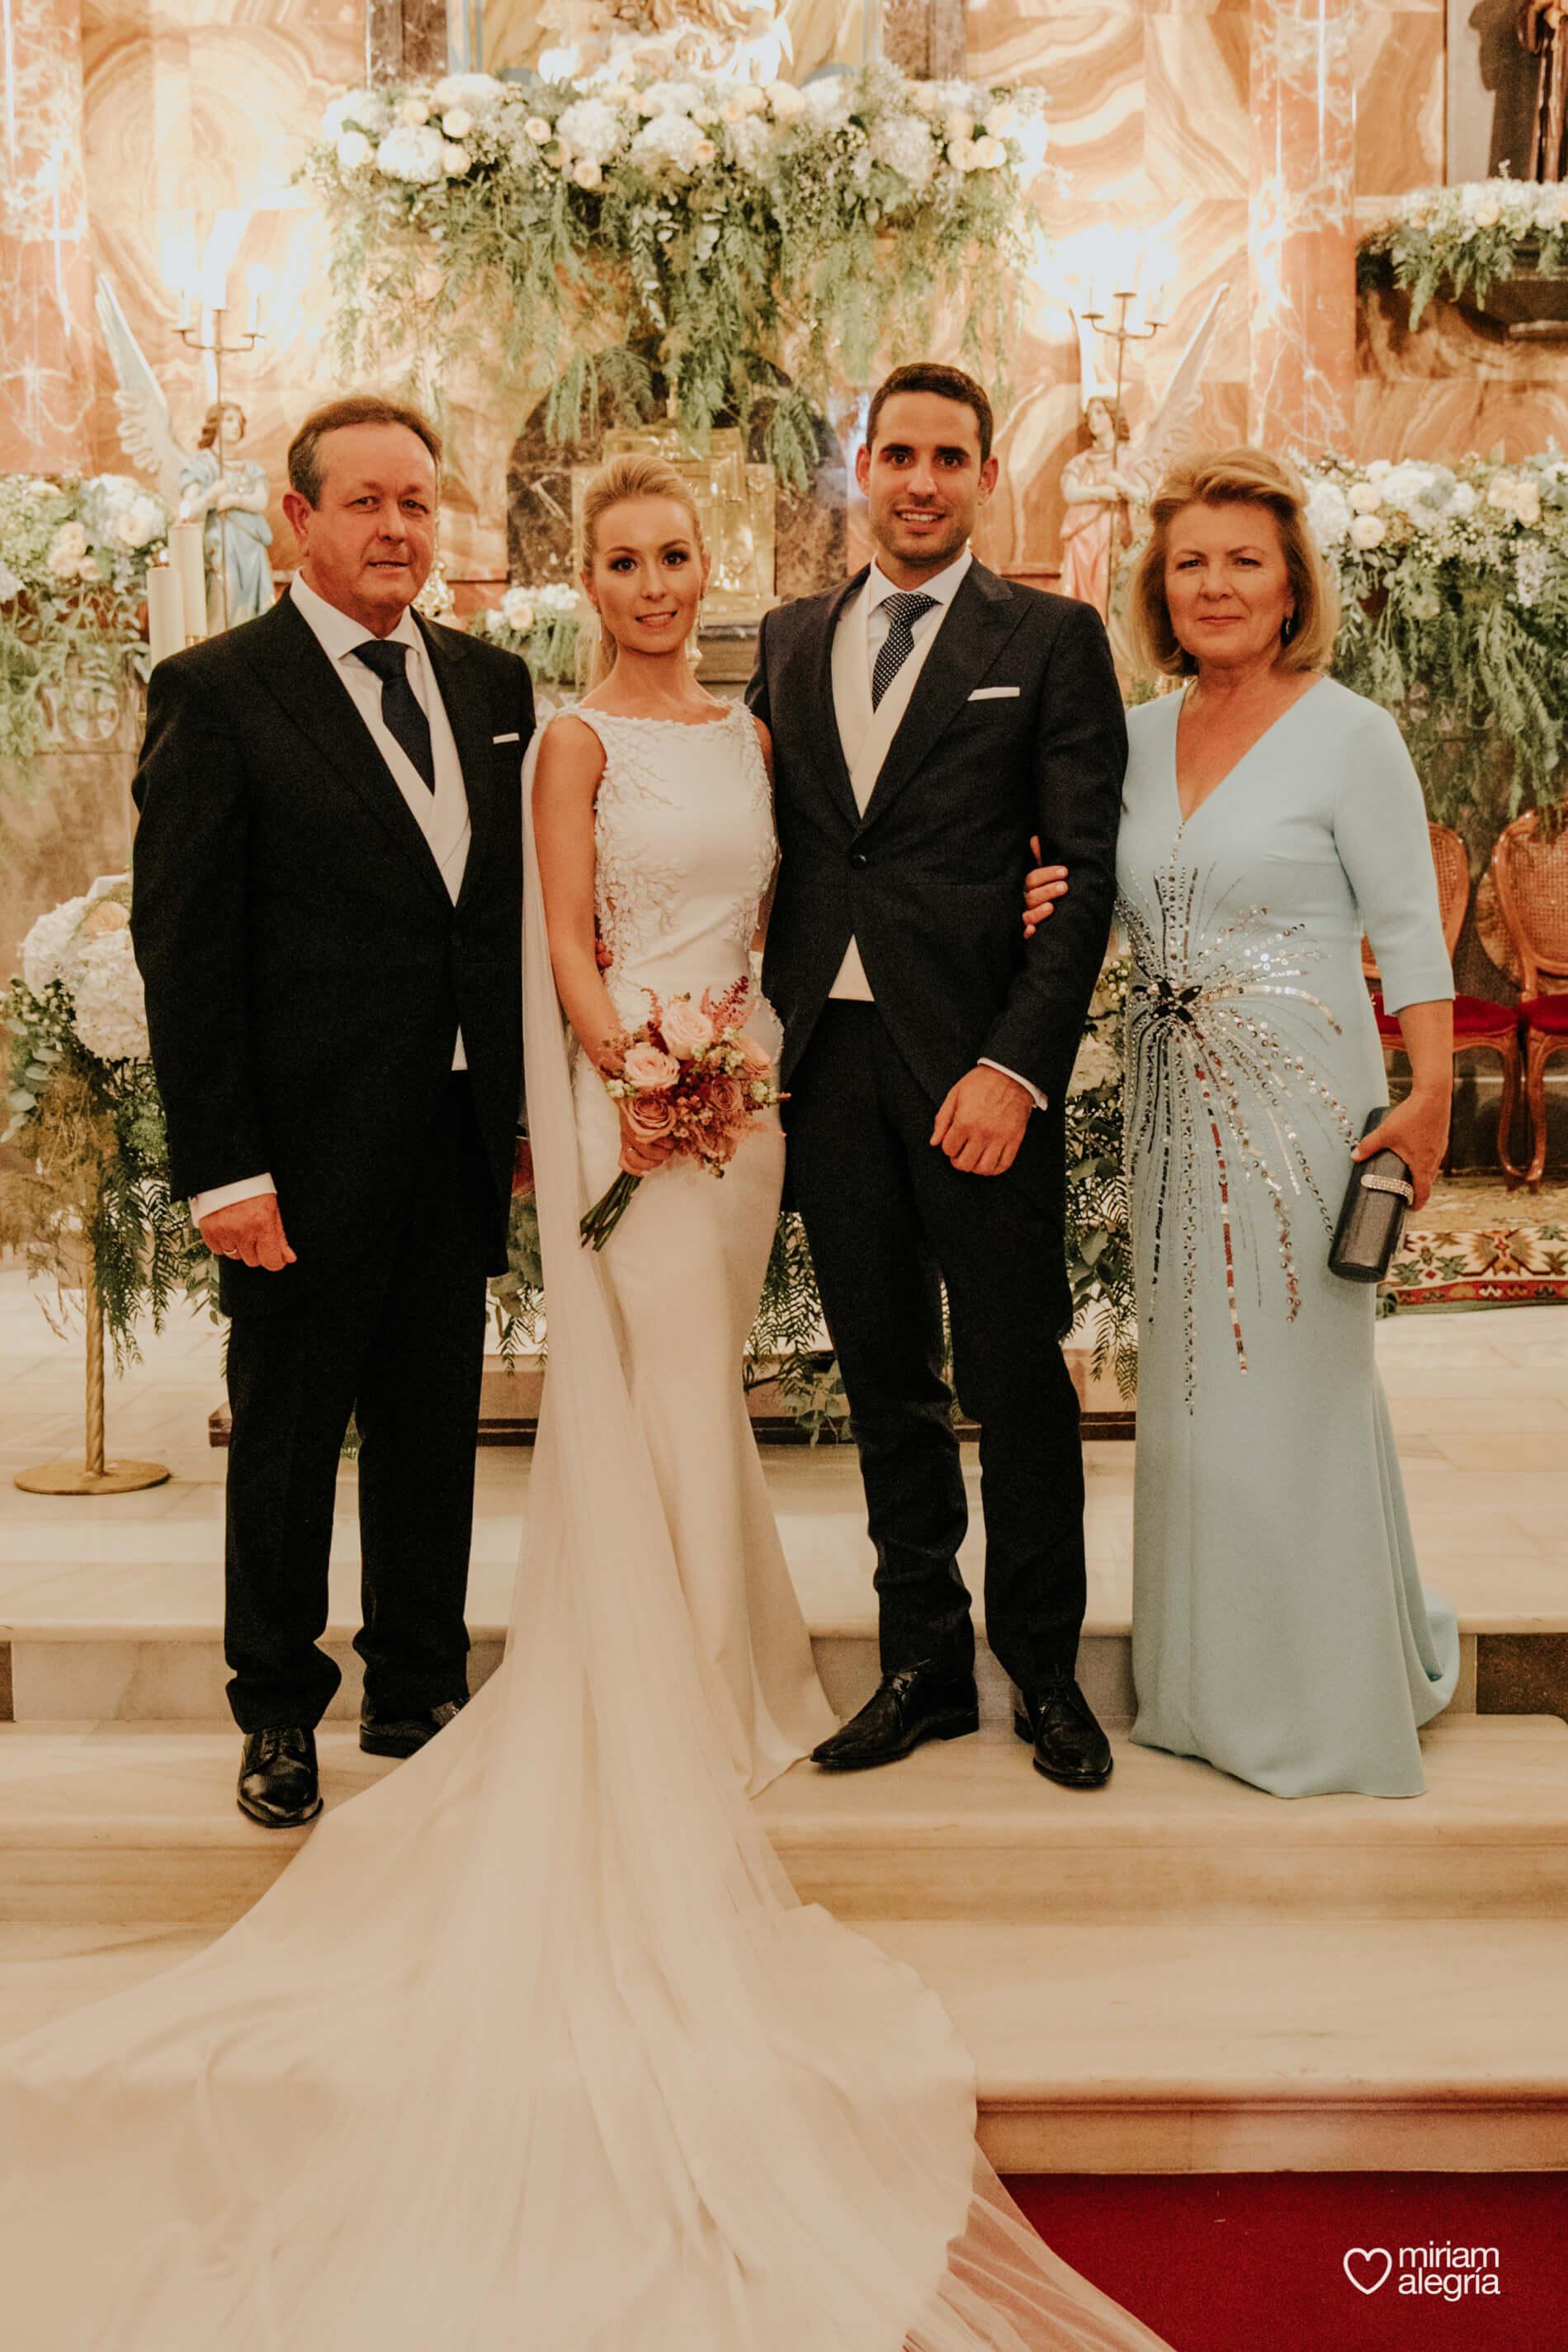 boda-en-almeria-miriam-alegria-122